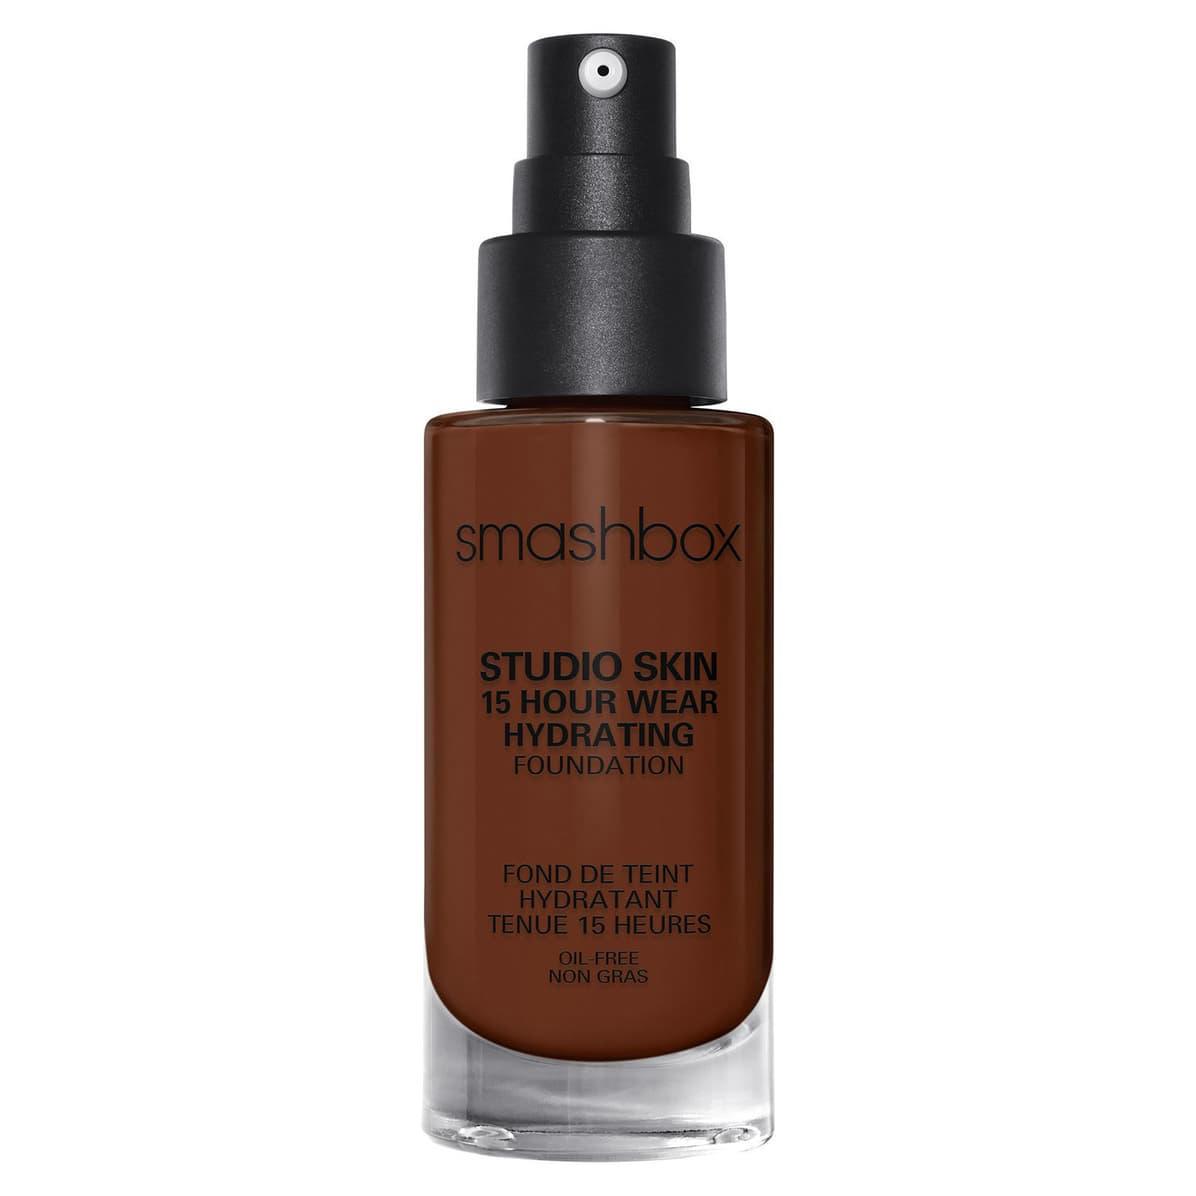 Smashbox Studio Skin 15 Hour Wear Hydrating Foundation 4.5